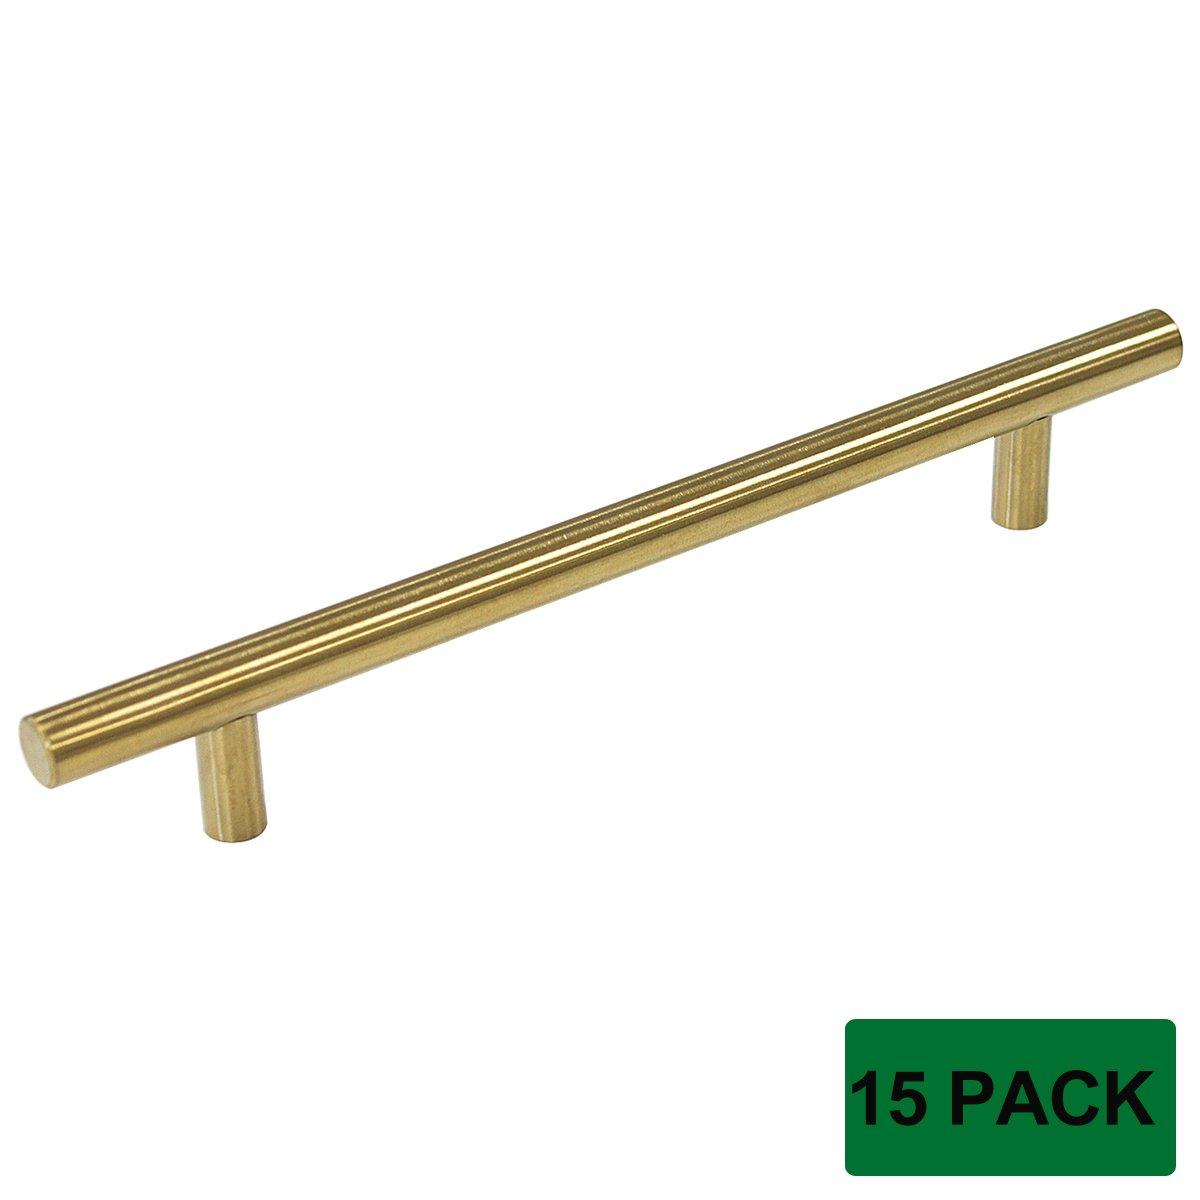 Satin Brass Cabinet Pulls Probrico Brushed Brass Modern Cabinet Hardware Drawer Handle Pulls